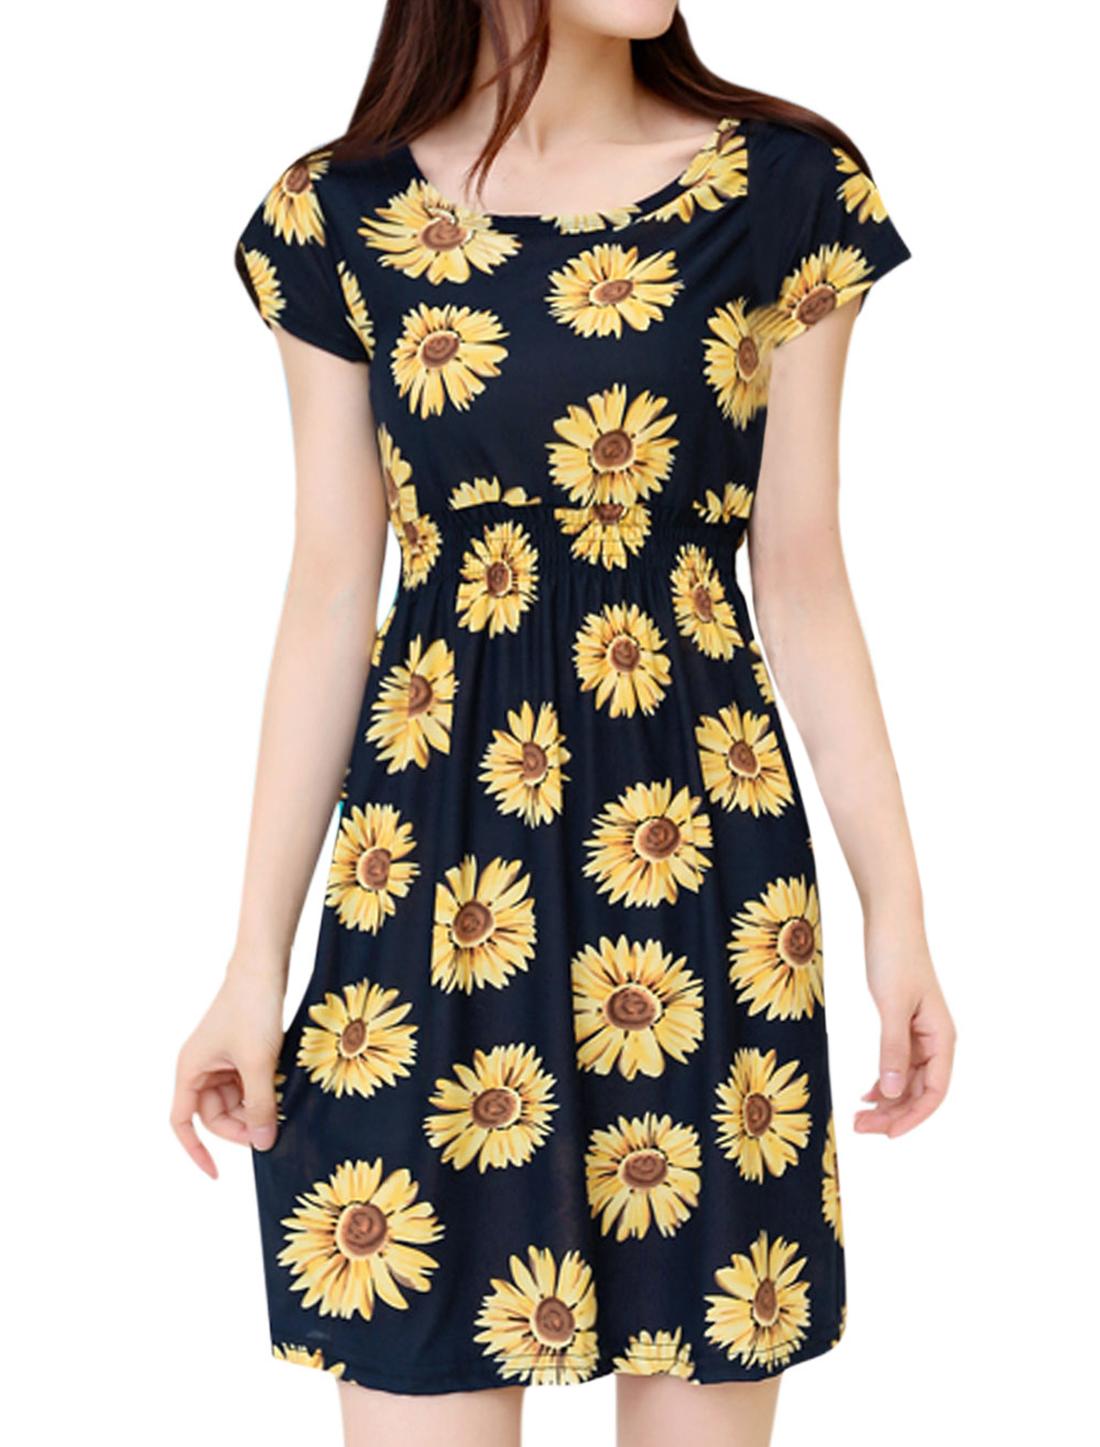 Ladies Sunflowers Pattern Elastic Waist Round Neck A Line Dress Black XS